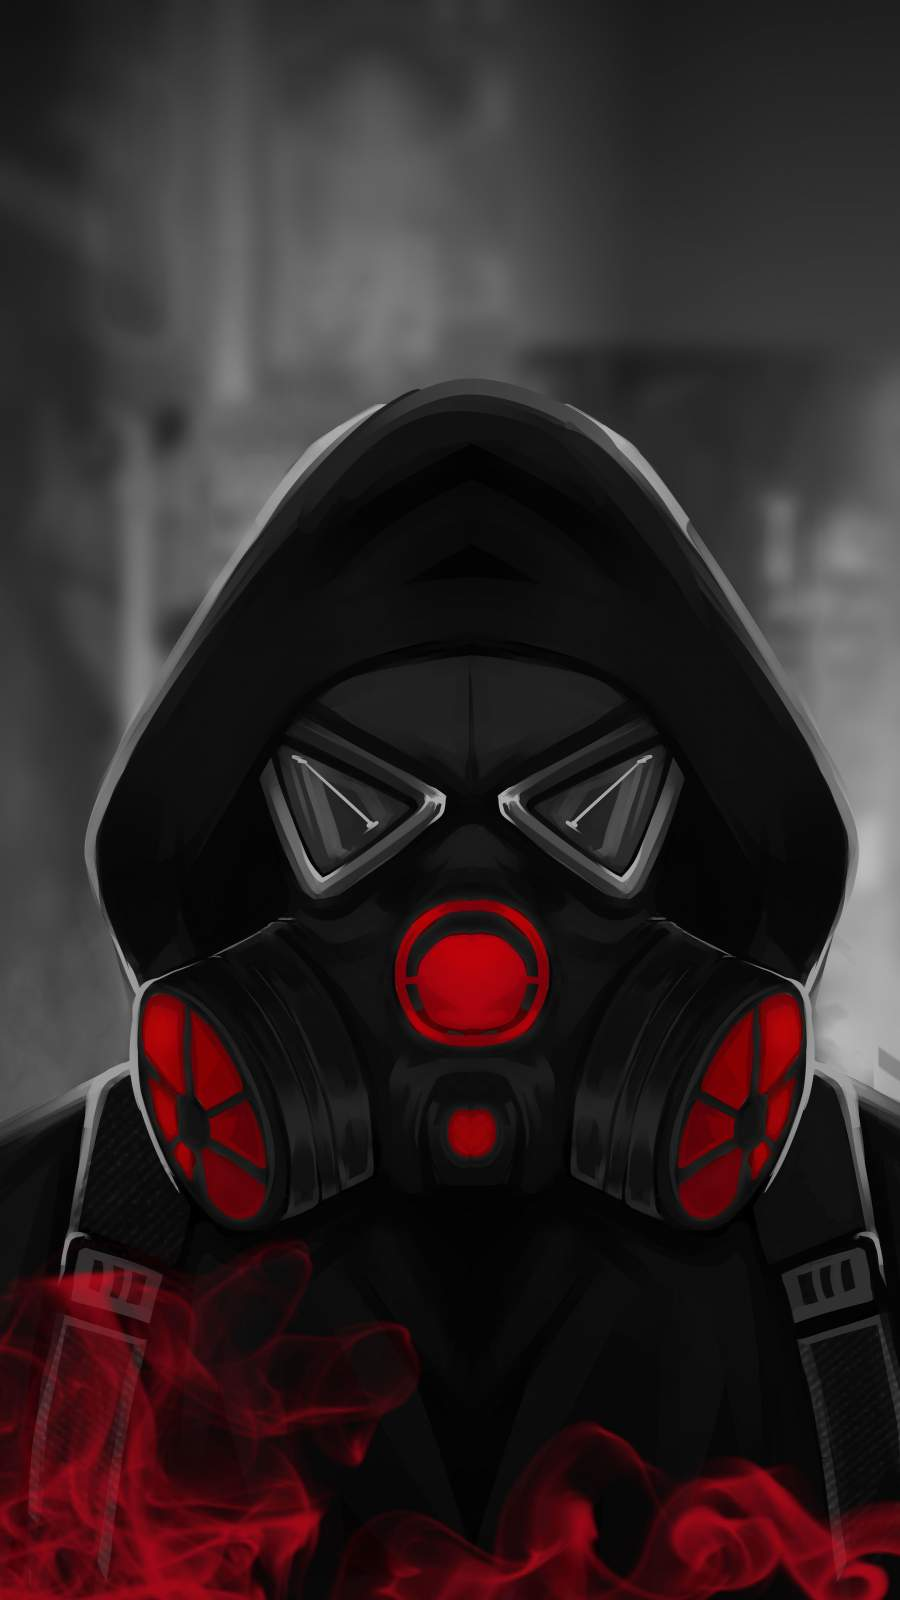 Smoke Mask Hoodie Guy